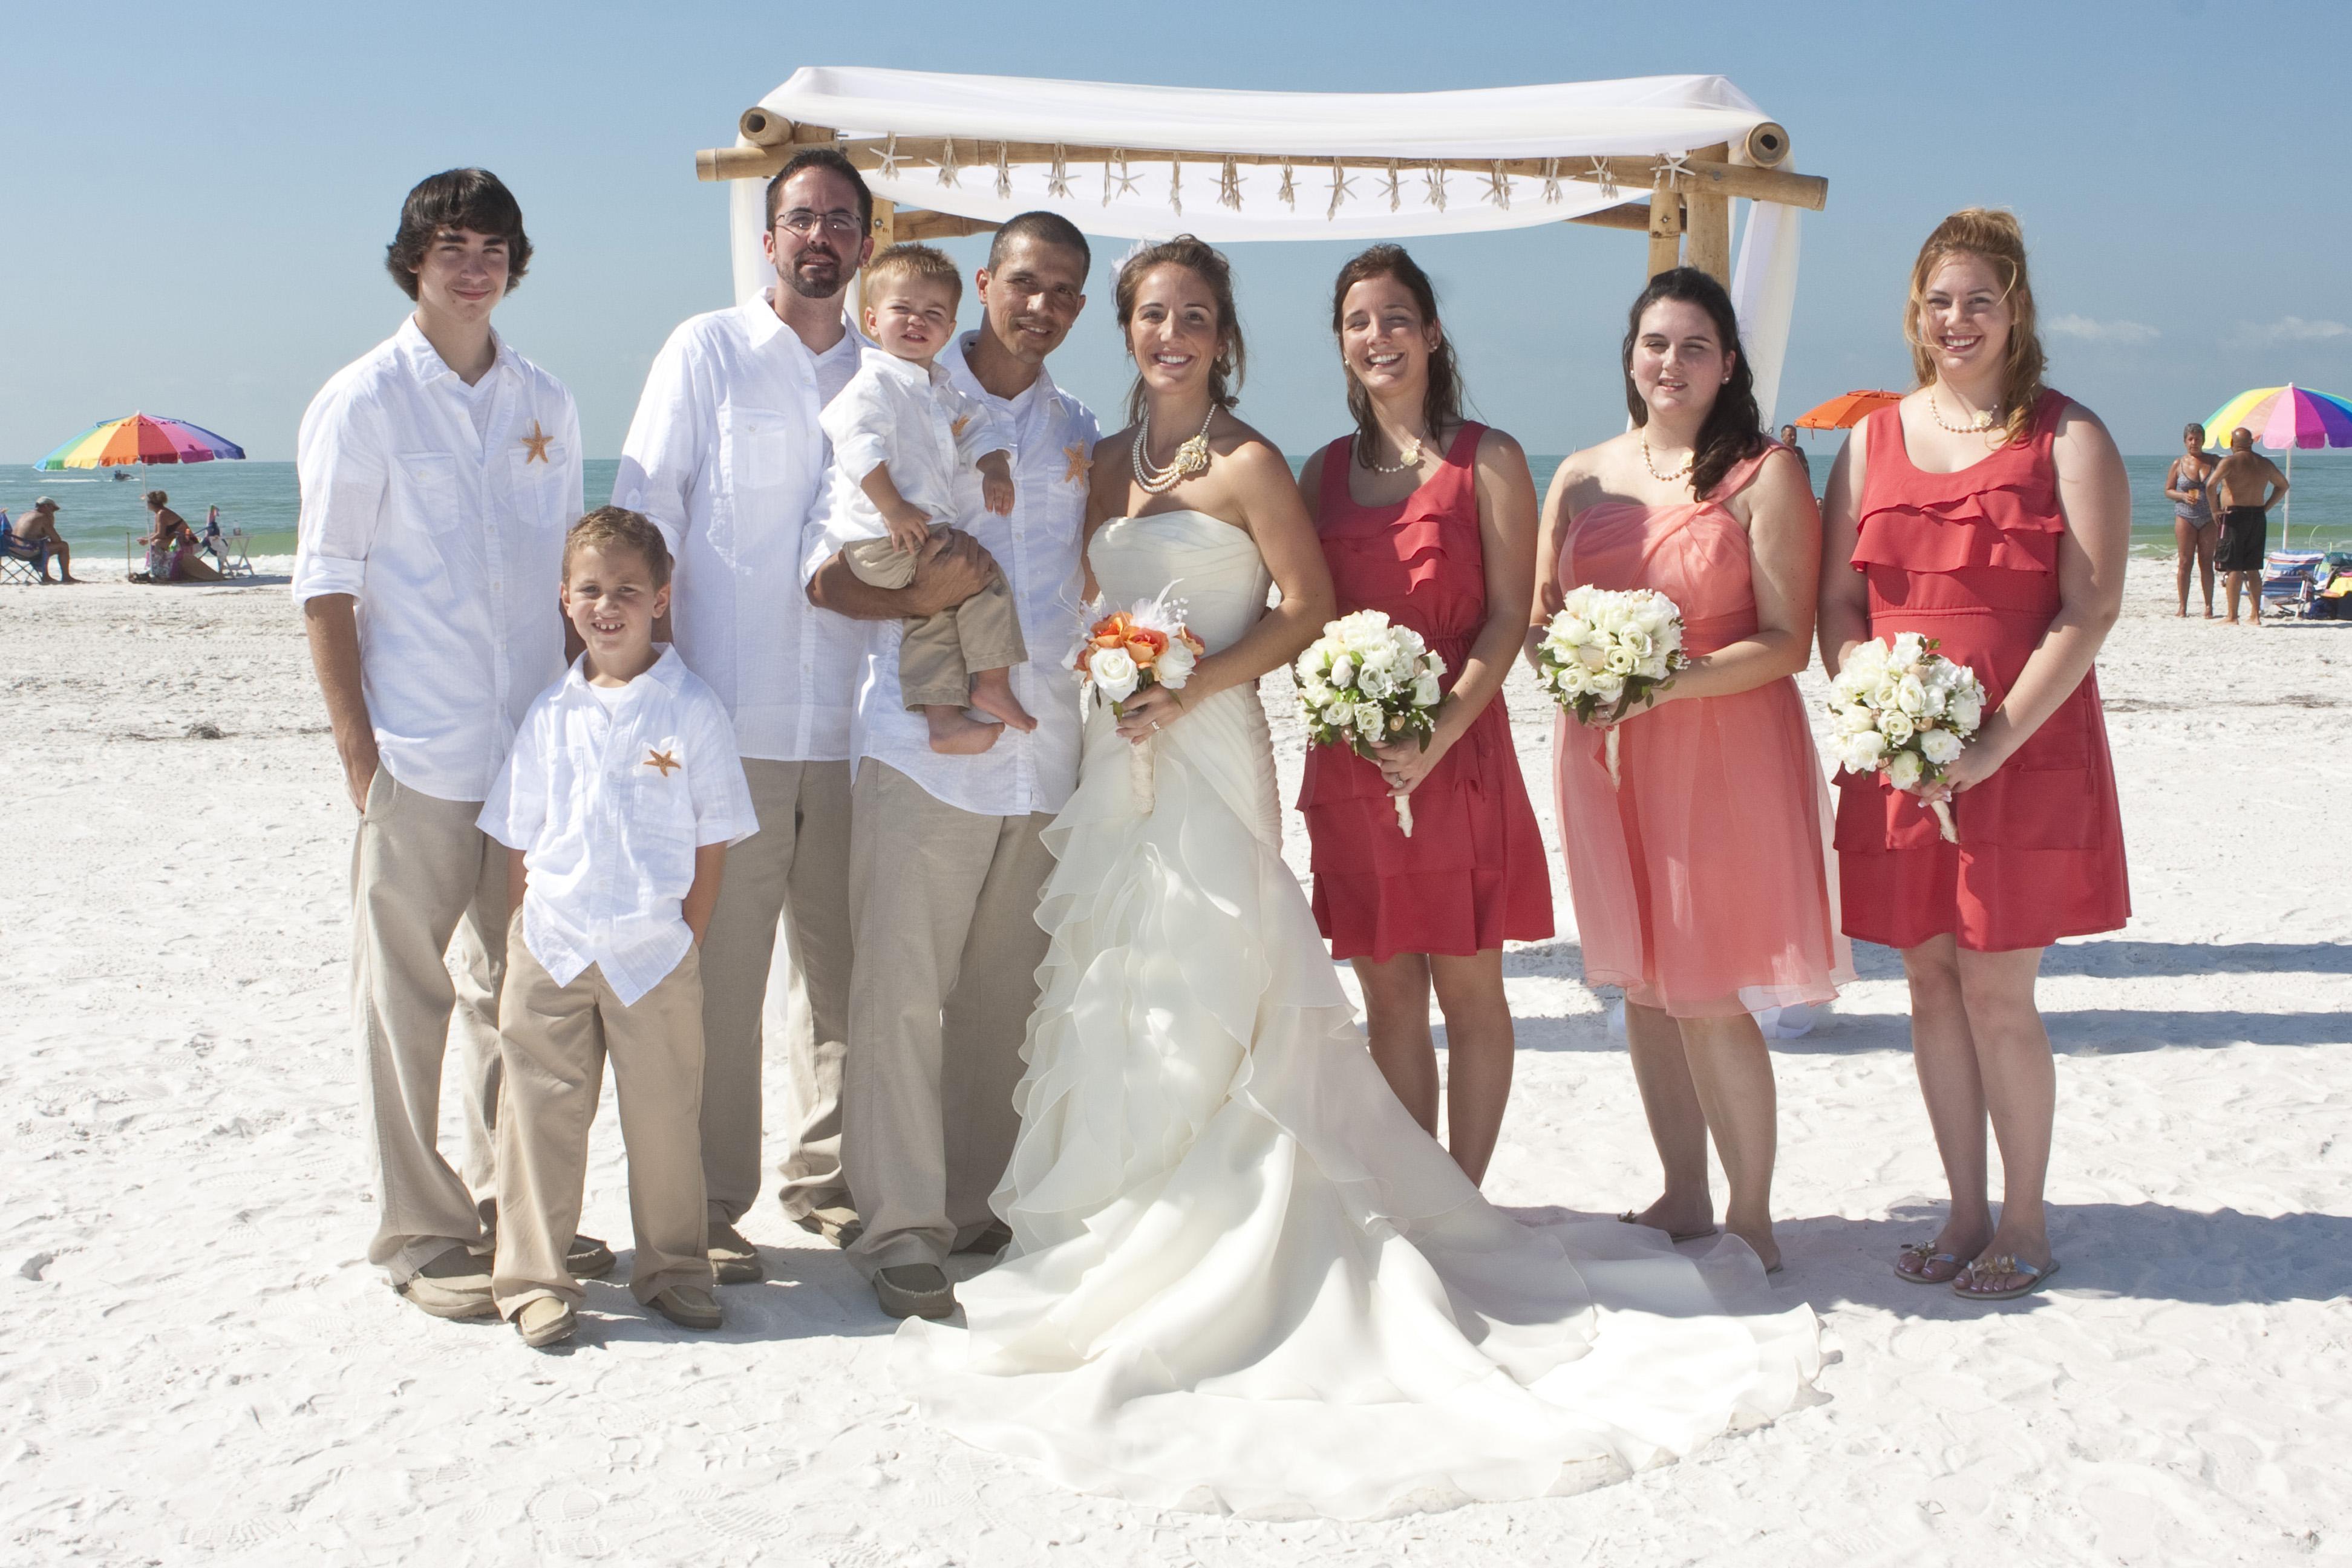 wedding dress beach casual photo - 1